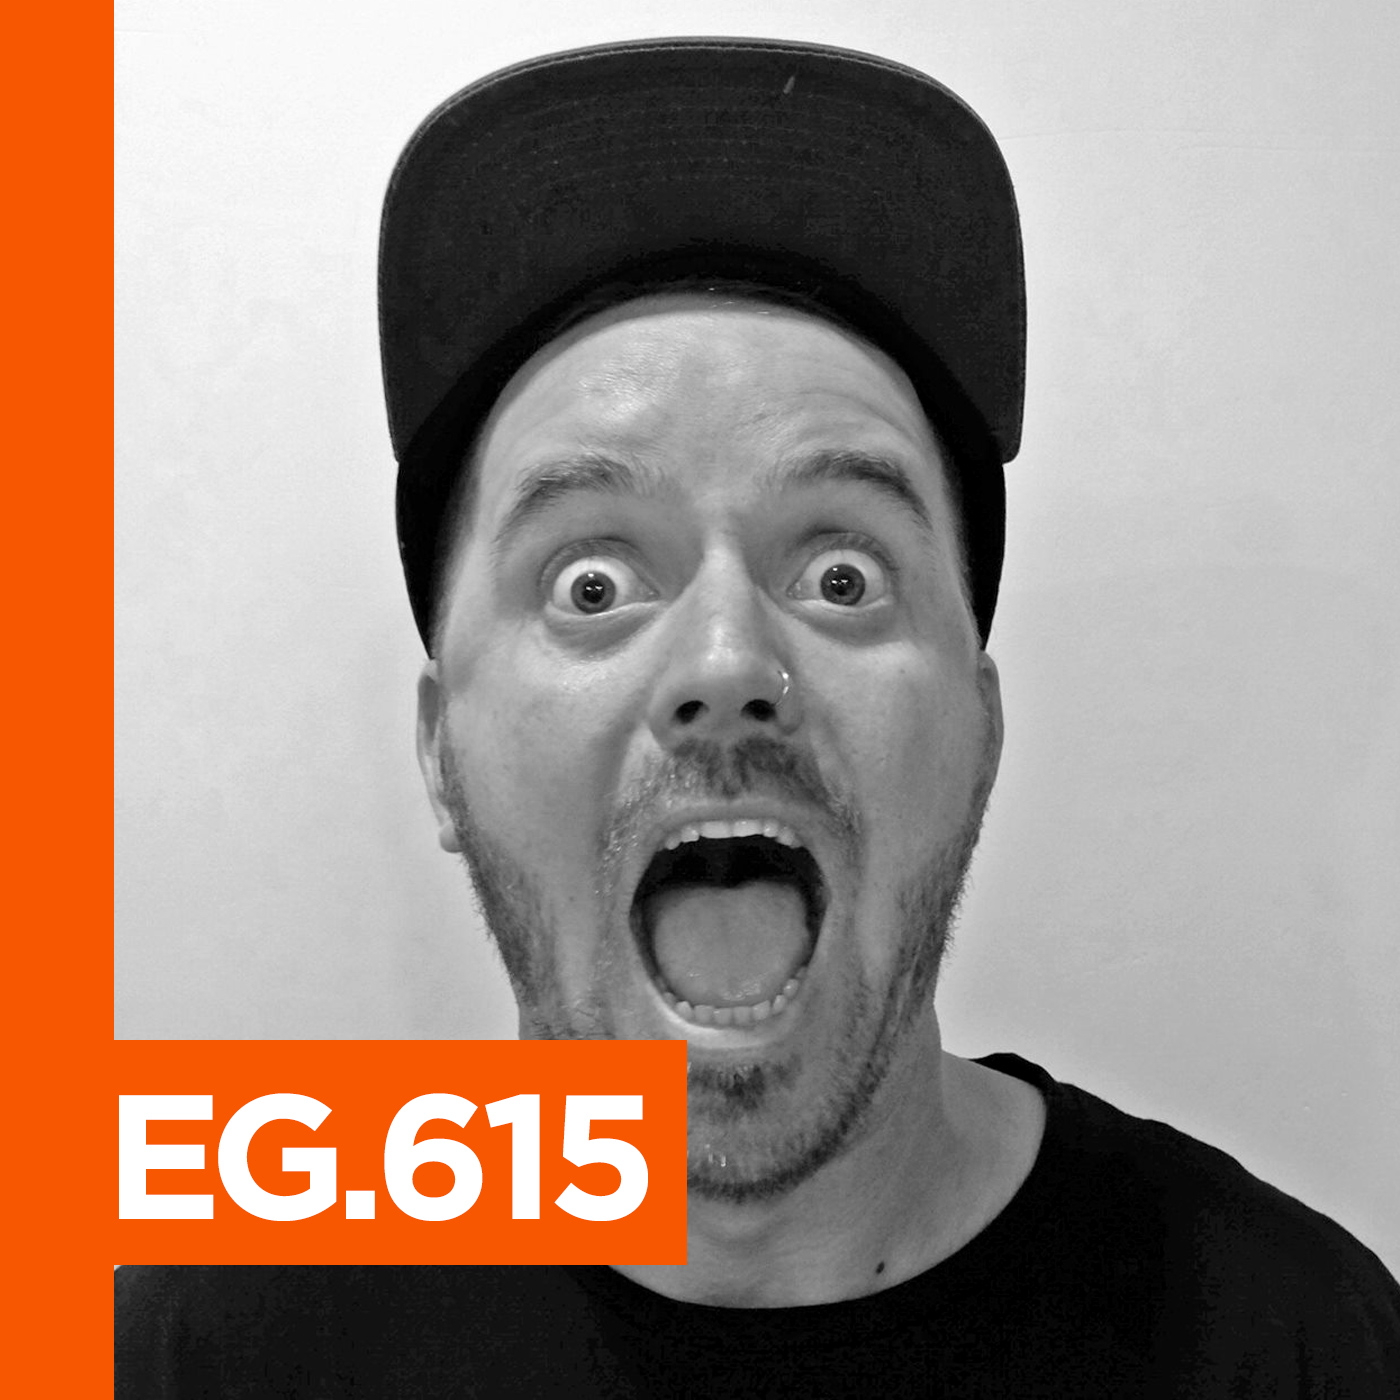 EG.615 Owen Howells